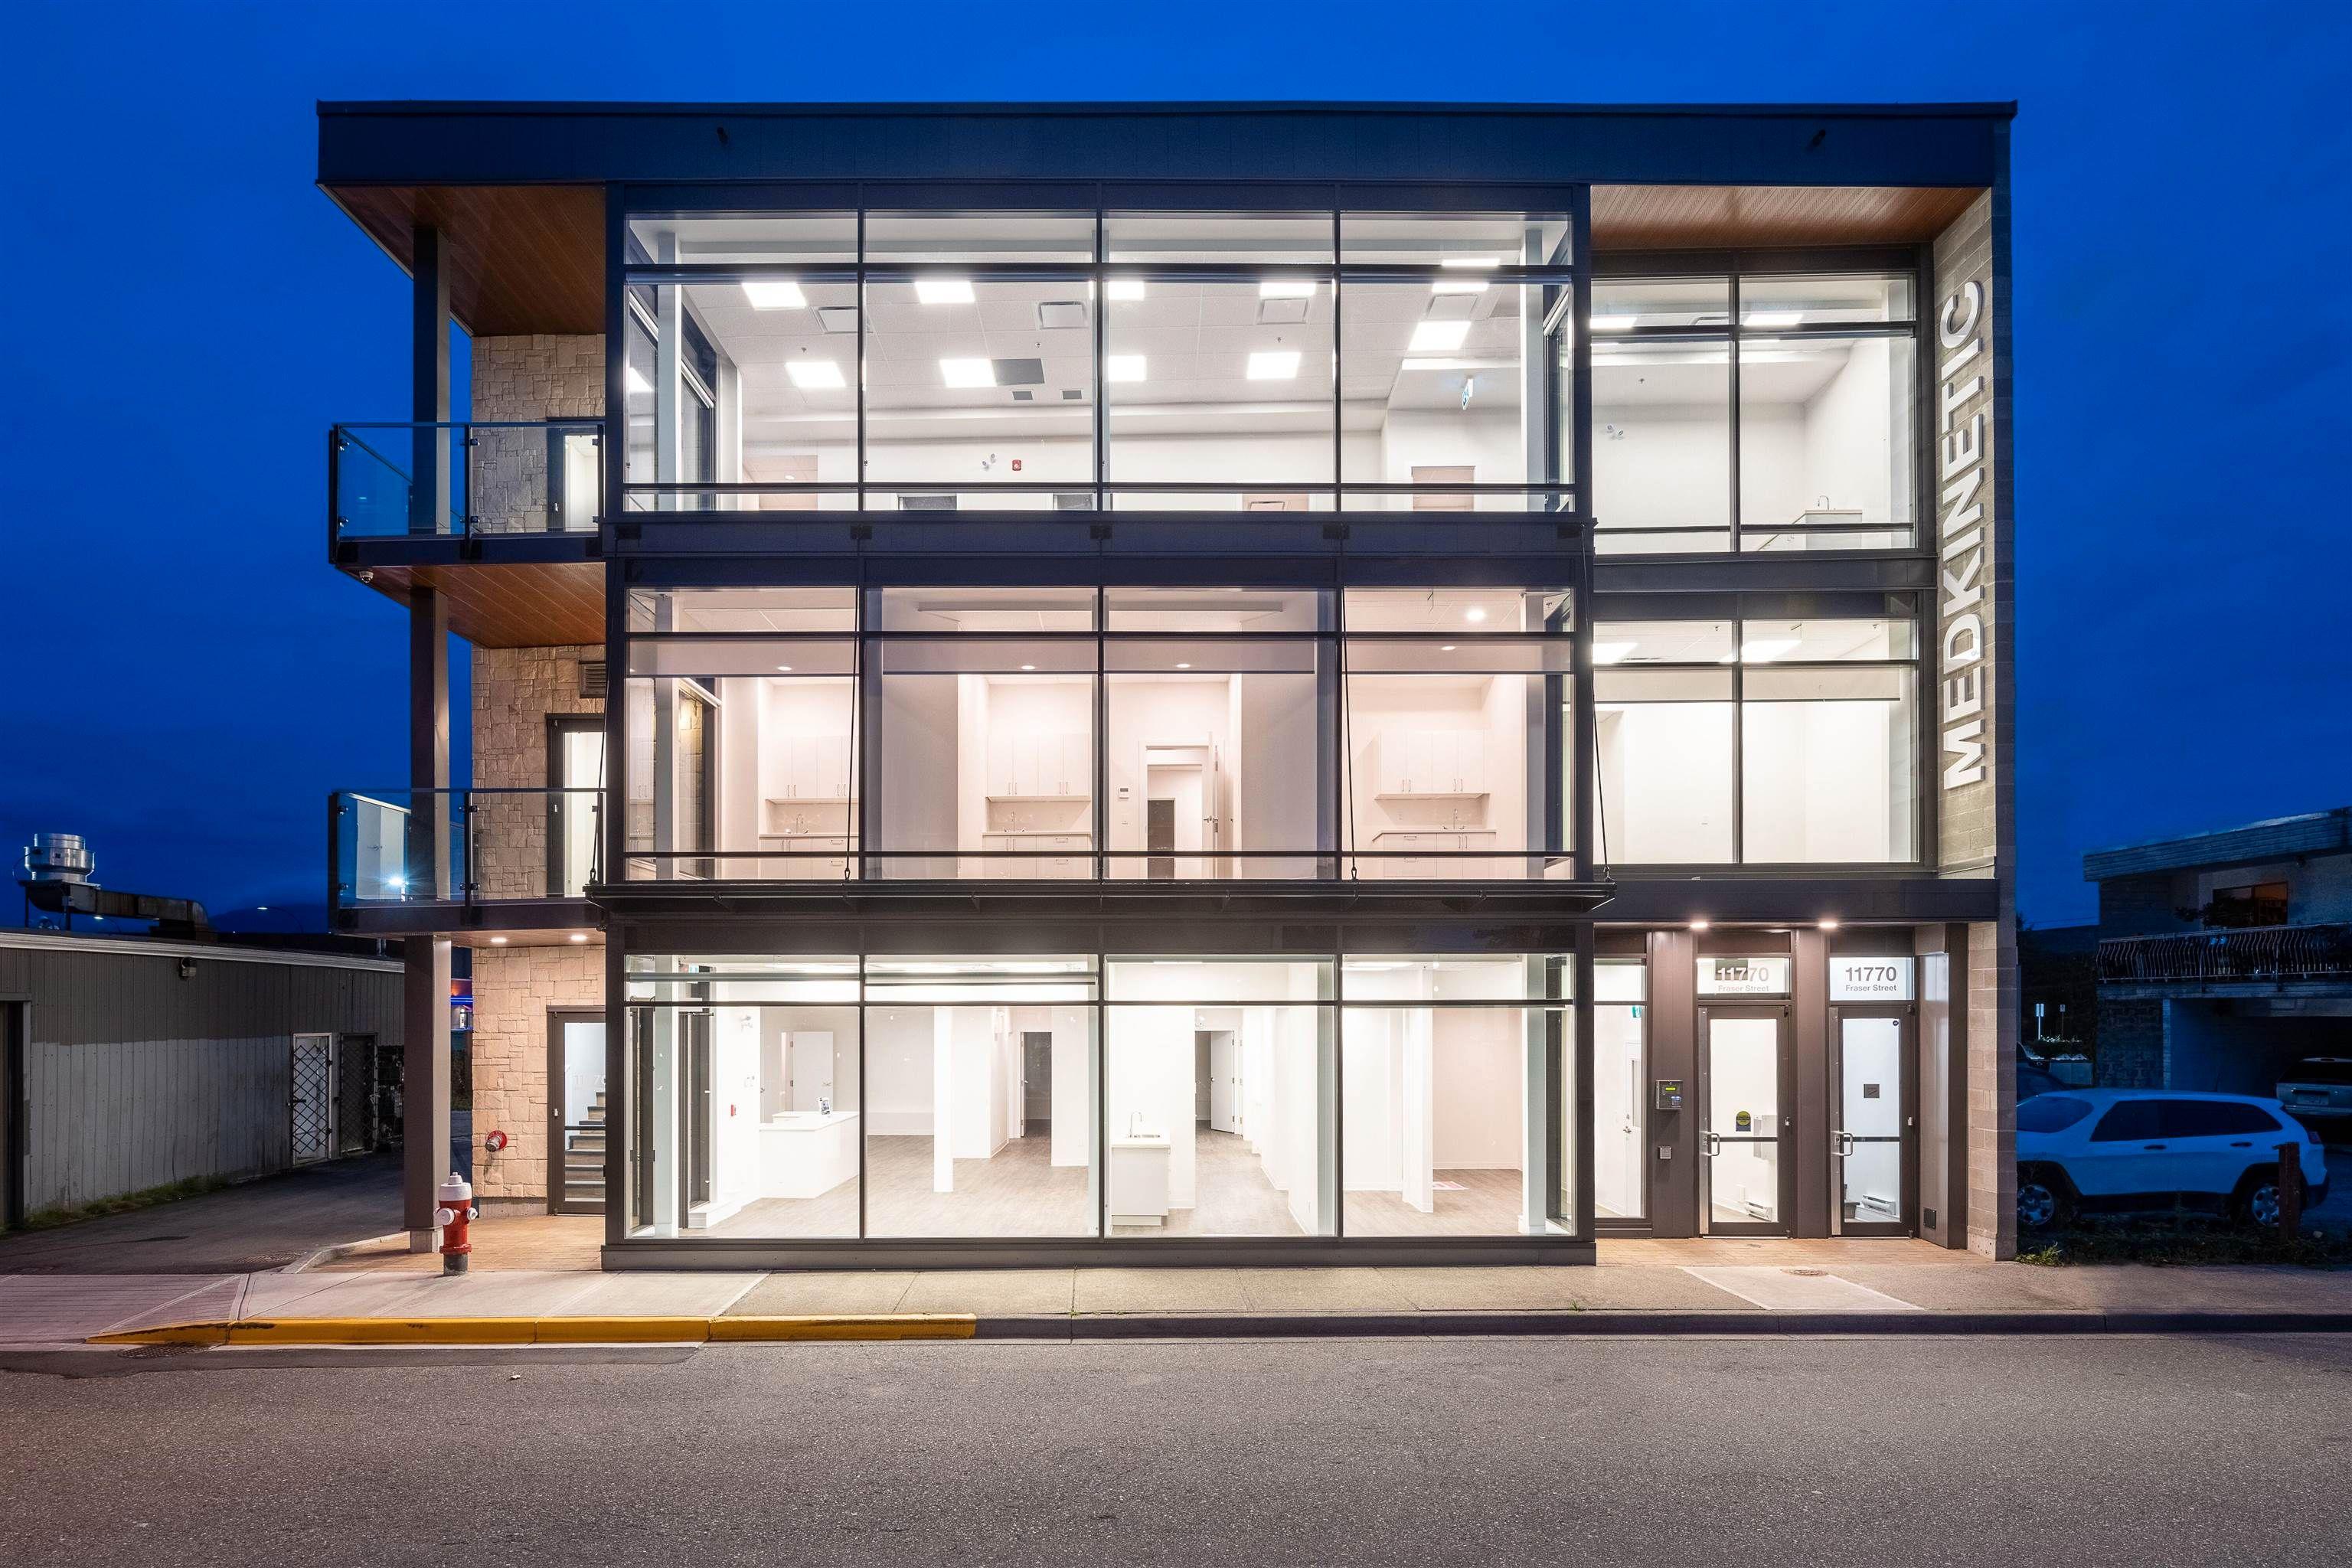 Main Photo: 100 11770 FRASER STREET in Maple Ridge: East Central Office for lease : MLS®# C8039775